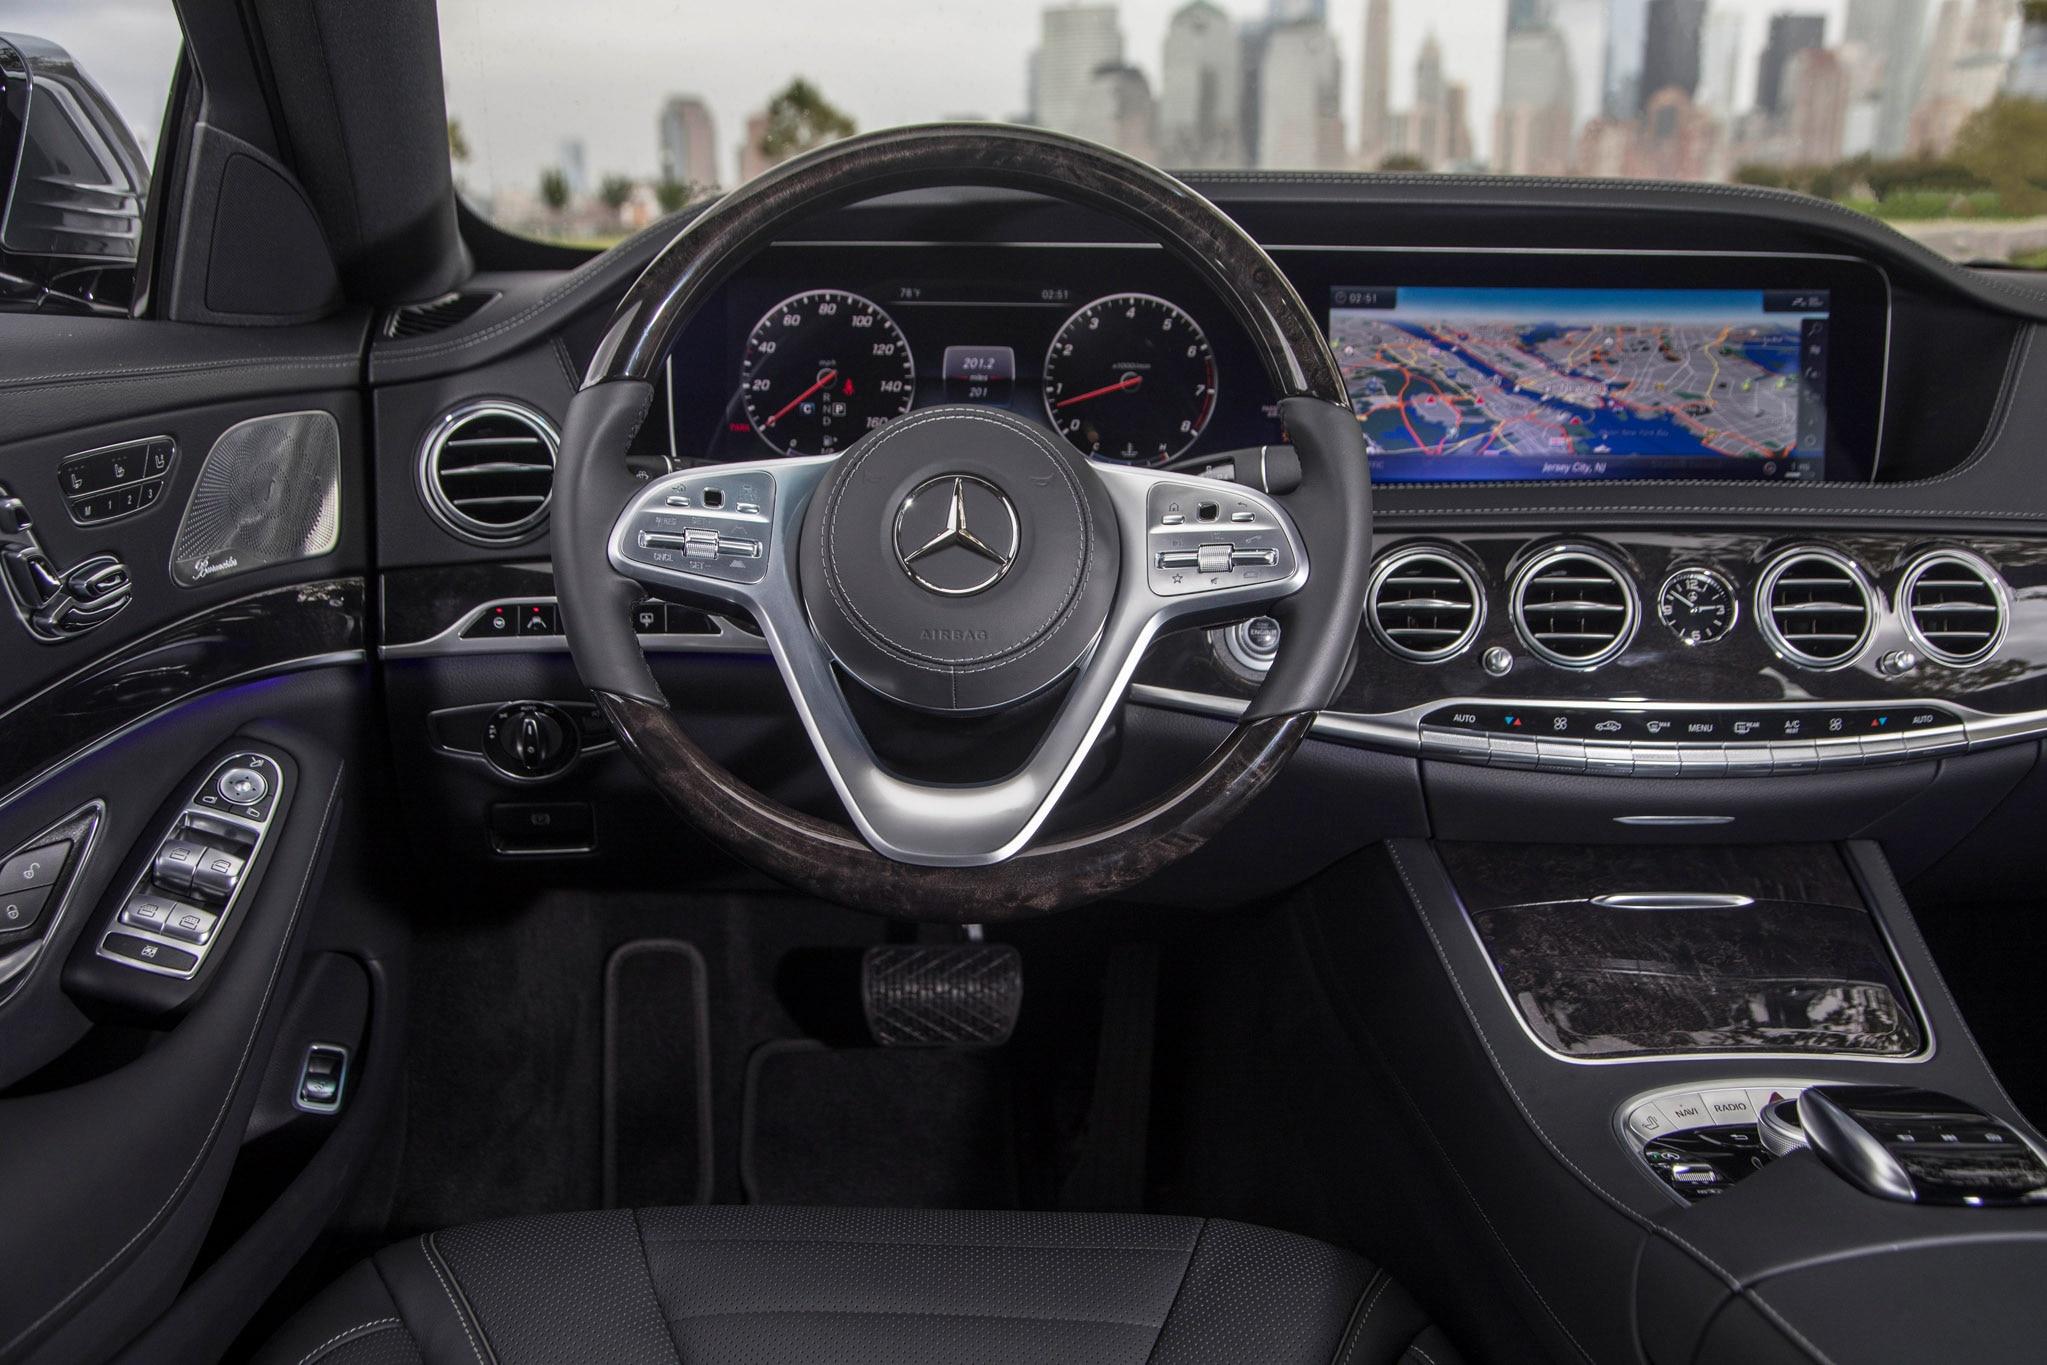 2017 Mercedes Benz S550 Sedan >> 2018 Mercedes-Benz S-Class Sedan vs. 2018 Mercedes-AMG S-Class Sedan | Automobile Magazine